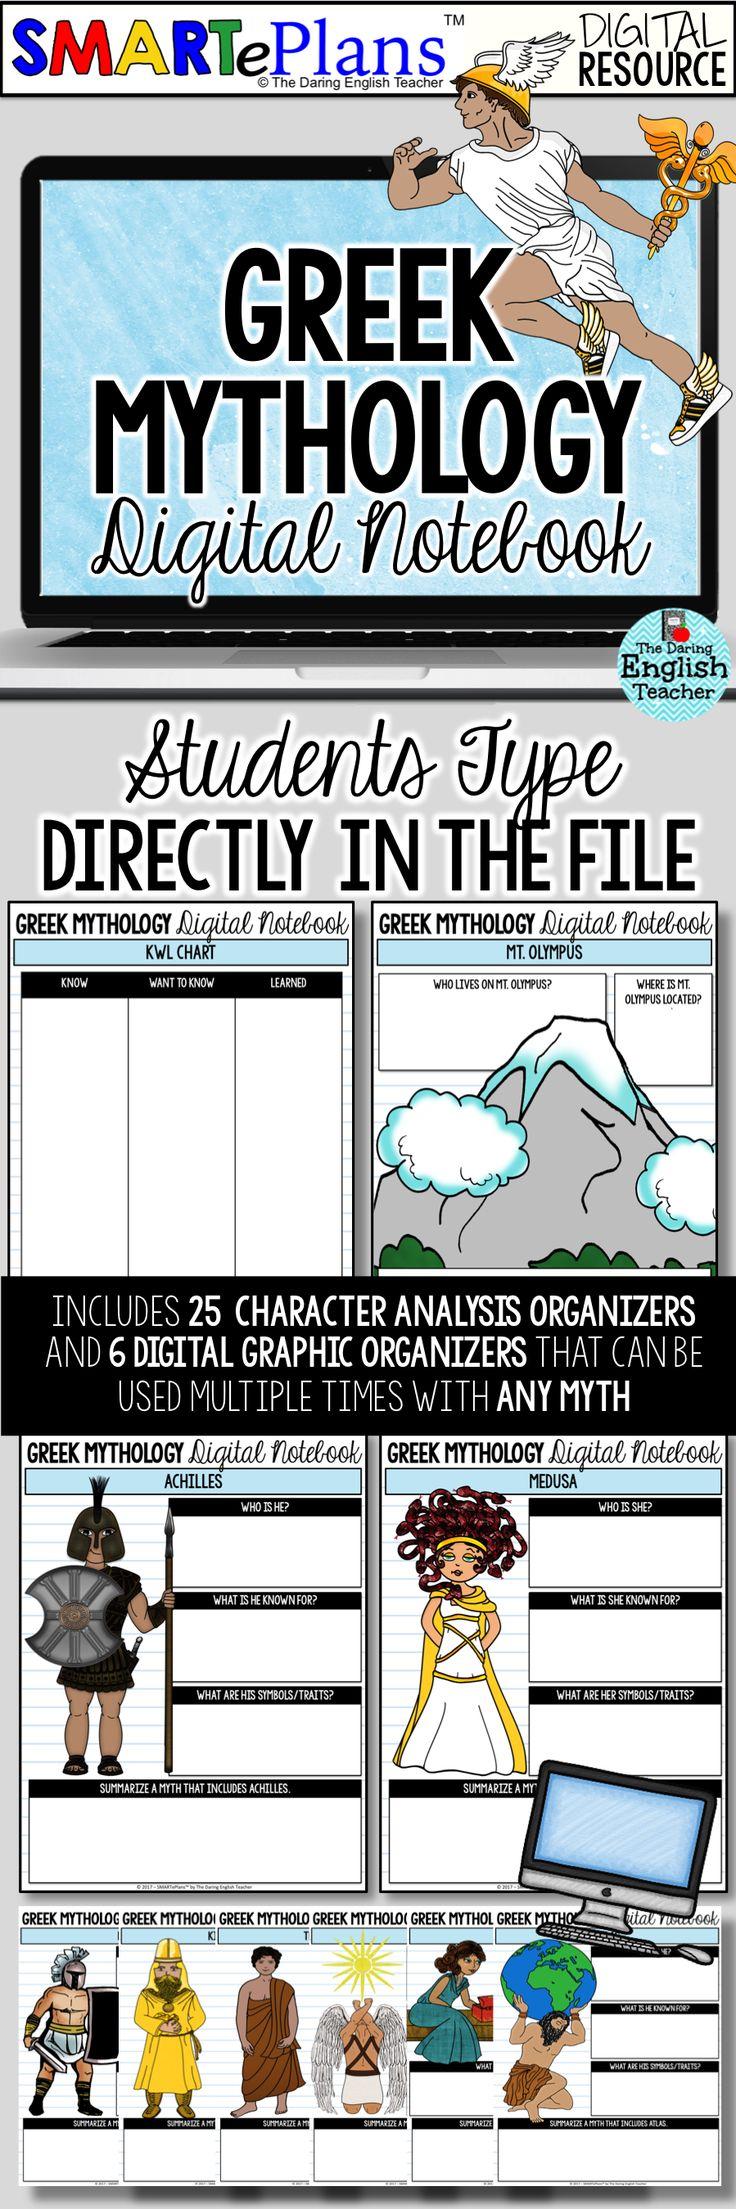 Digital Greek Mythology teaching interactive notebook for Google Drive. Greek Mythology for middle school ELA, high school English. Greek mythology character analysis. Greek mythology graphic organizers.